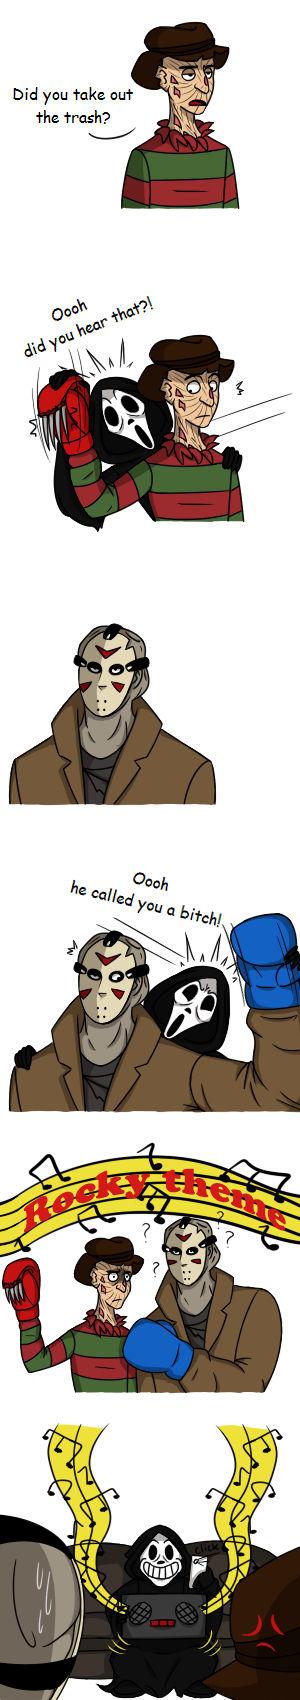 Freddy vs Jason 2 be like